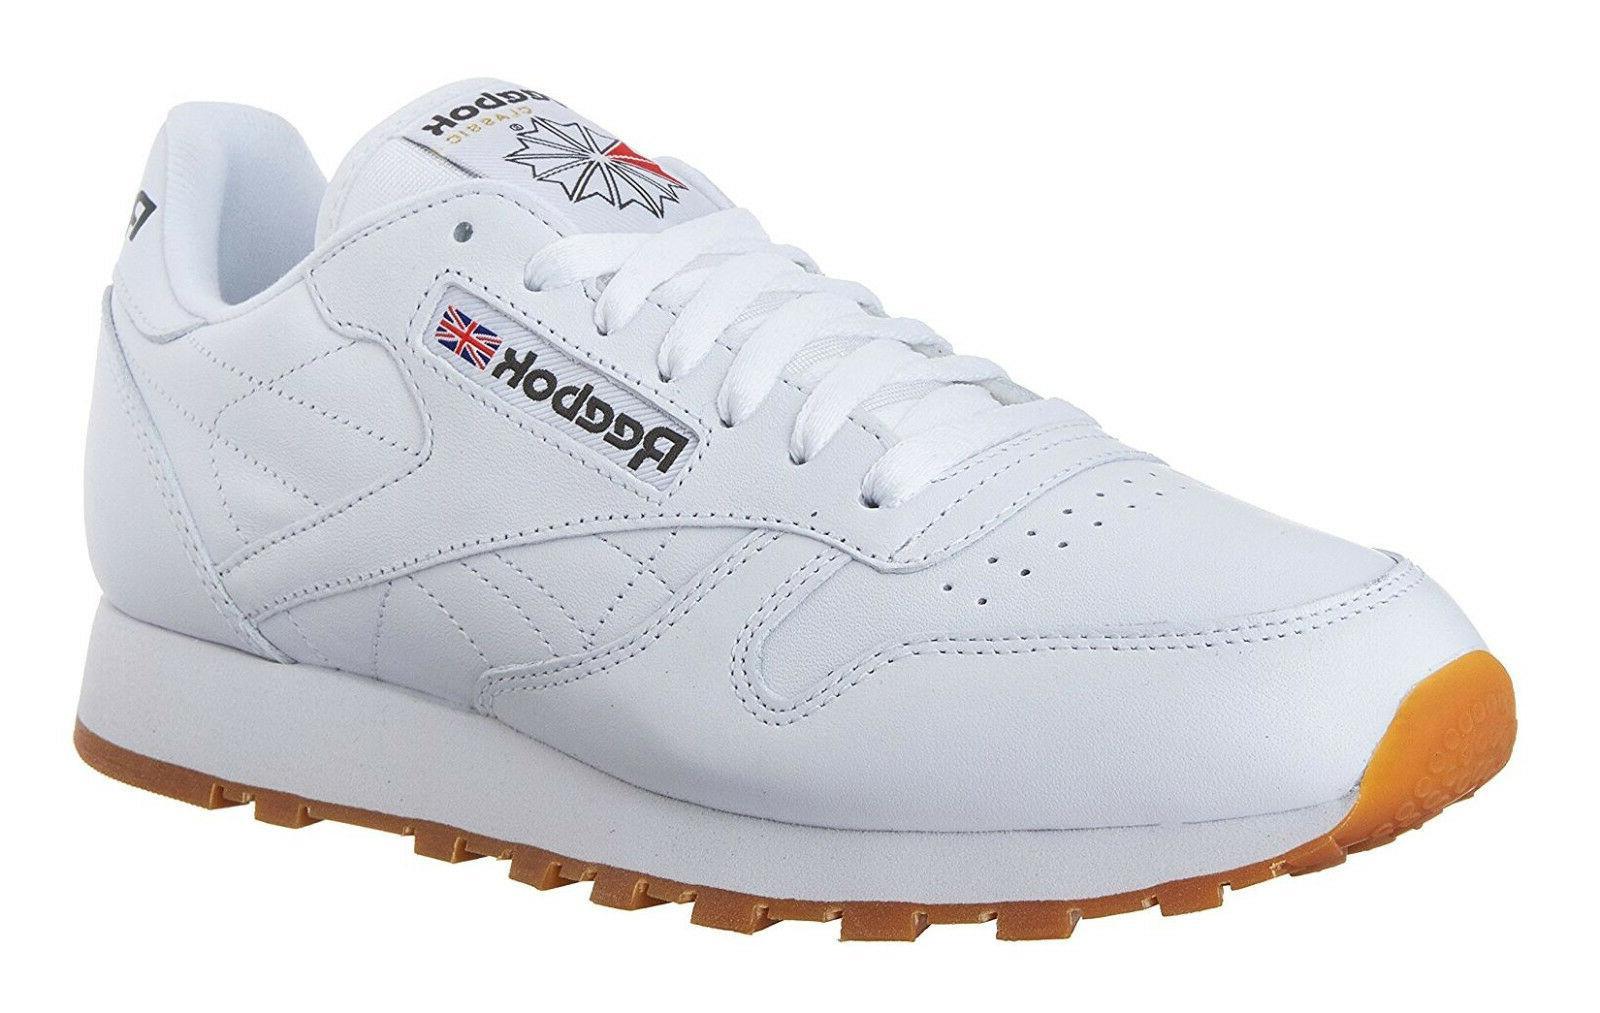 classic leather white gum mens running tennis